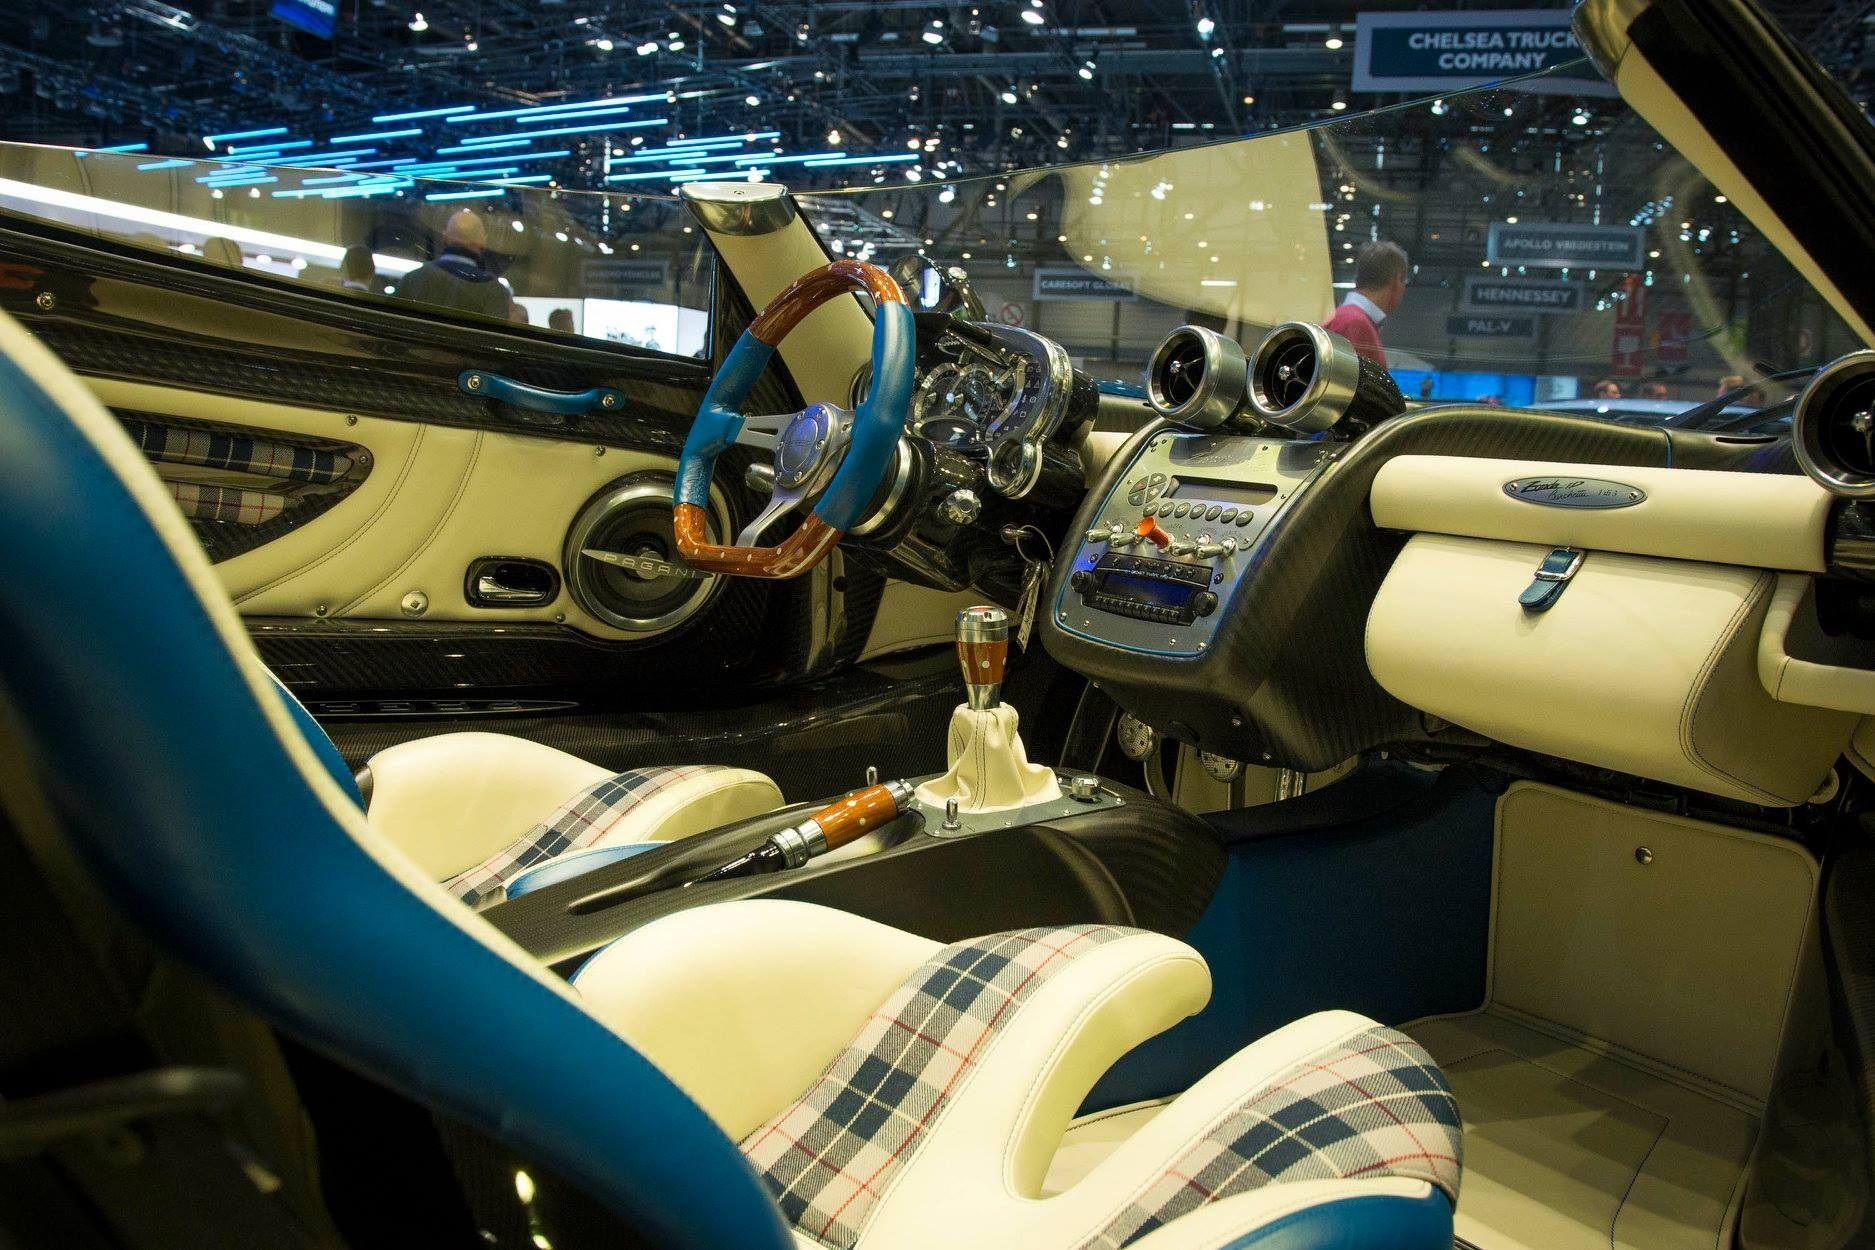 Pagani Zonda Hp Barchetta S Interior Pagani Pagani Zonda Steering Wheel